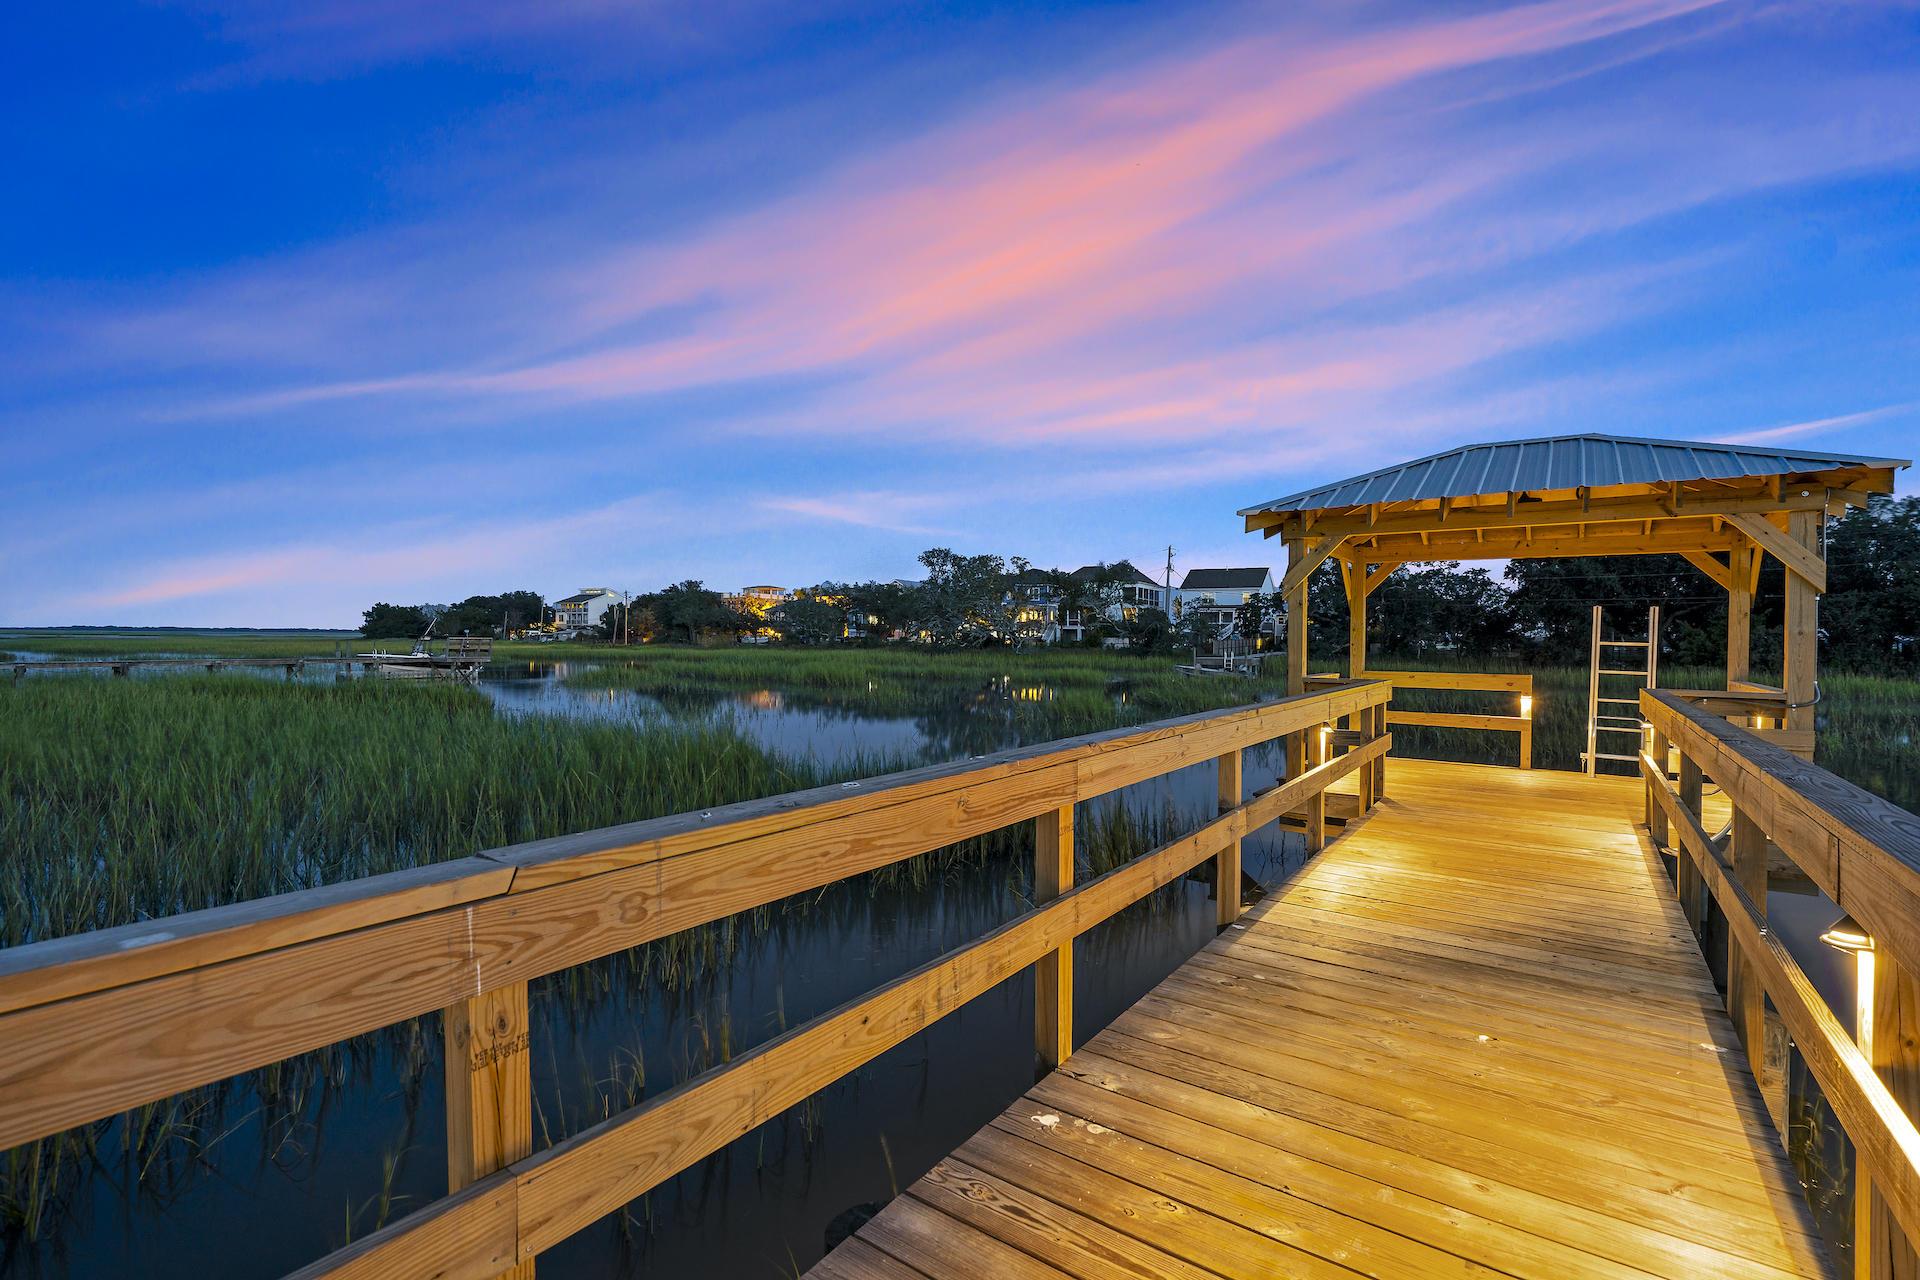 1522 Charming Nancy Road, Charleston, 29412, 4 Bedrooms Bedrooms, ,3 BathroomsBathrooms,For Sale,Charming Nancy,21010529